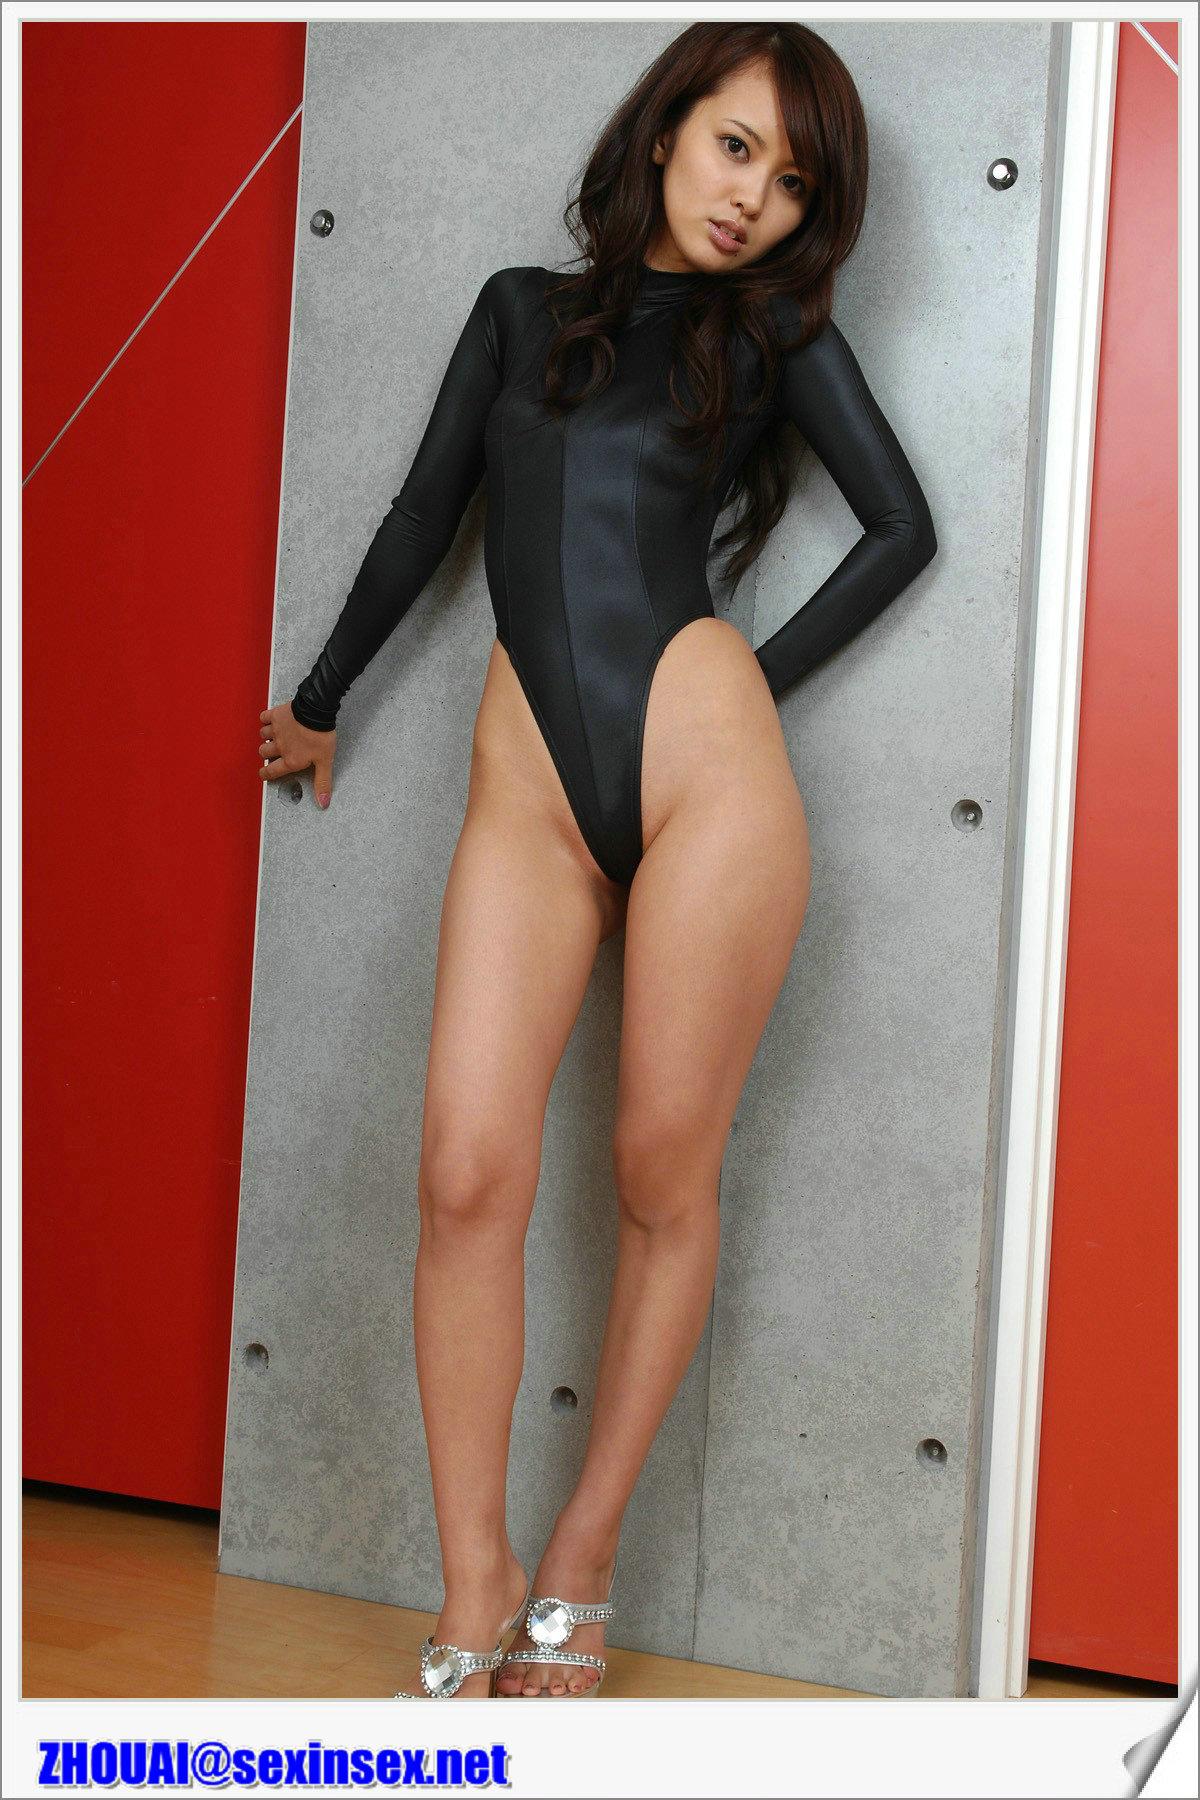 Японочка раздвигает ножки фото 10 фотография